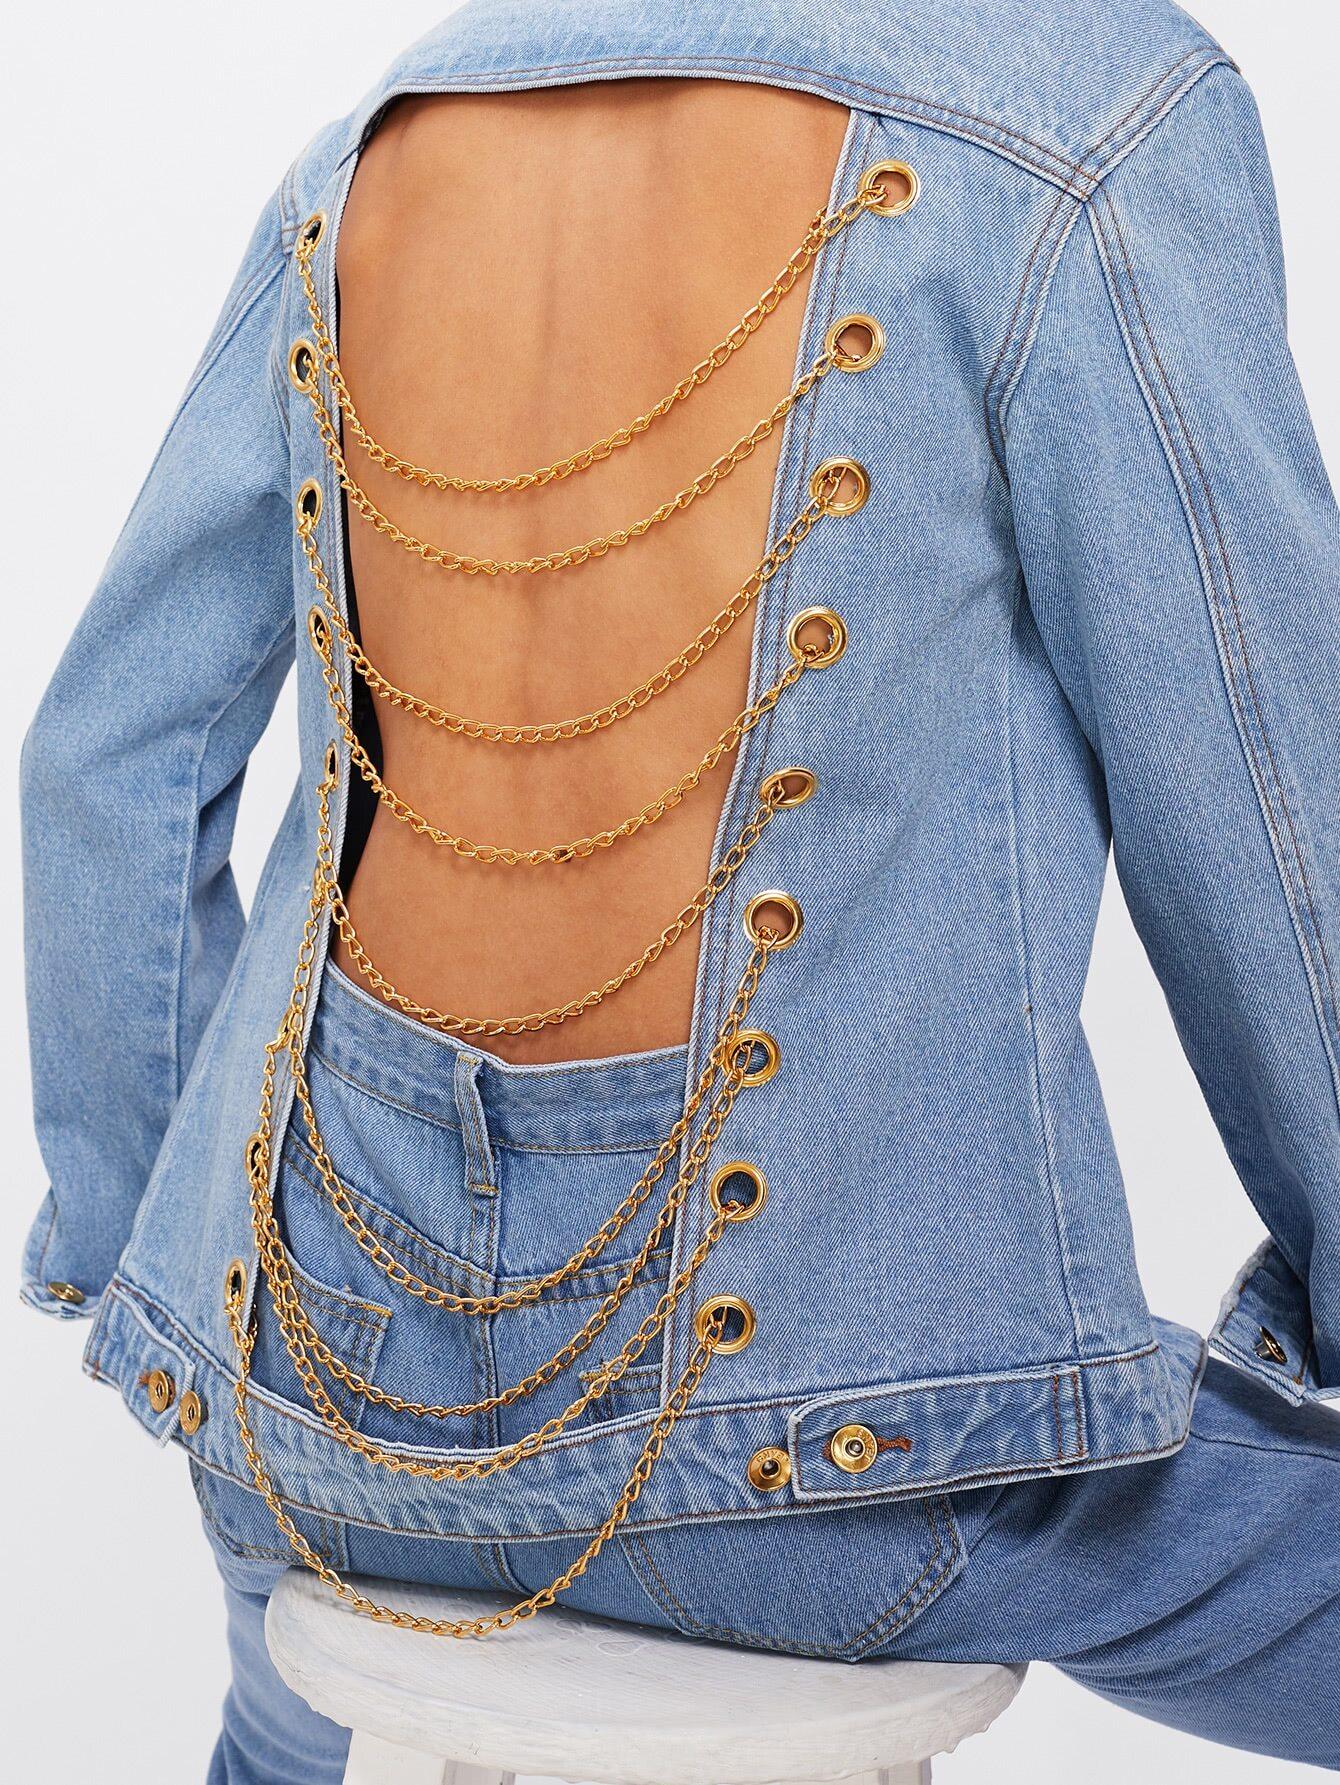 Grommet Ladder Chain Back Jacket Emmacloth Women Fast